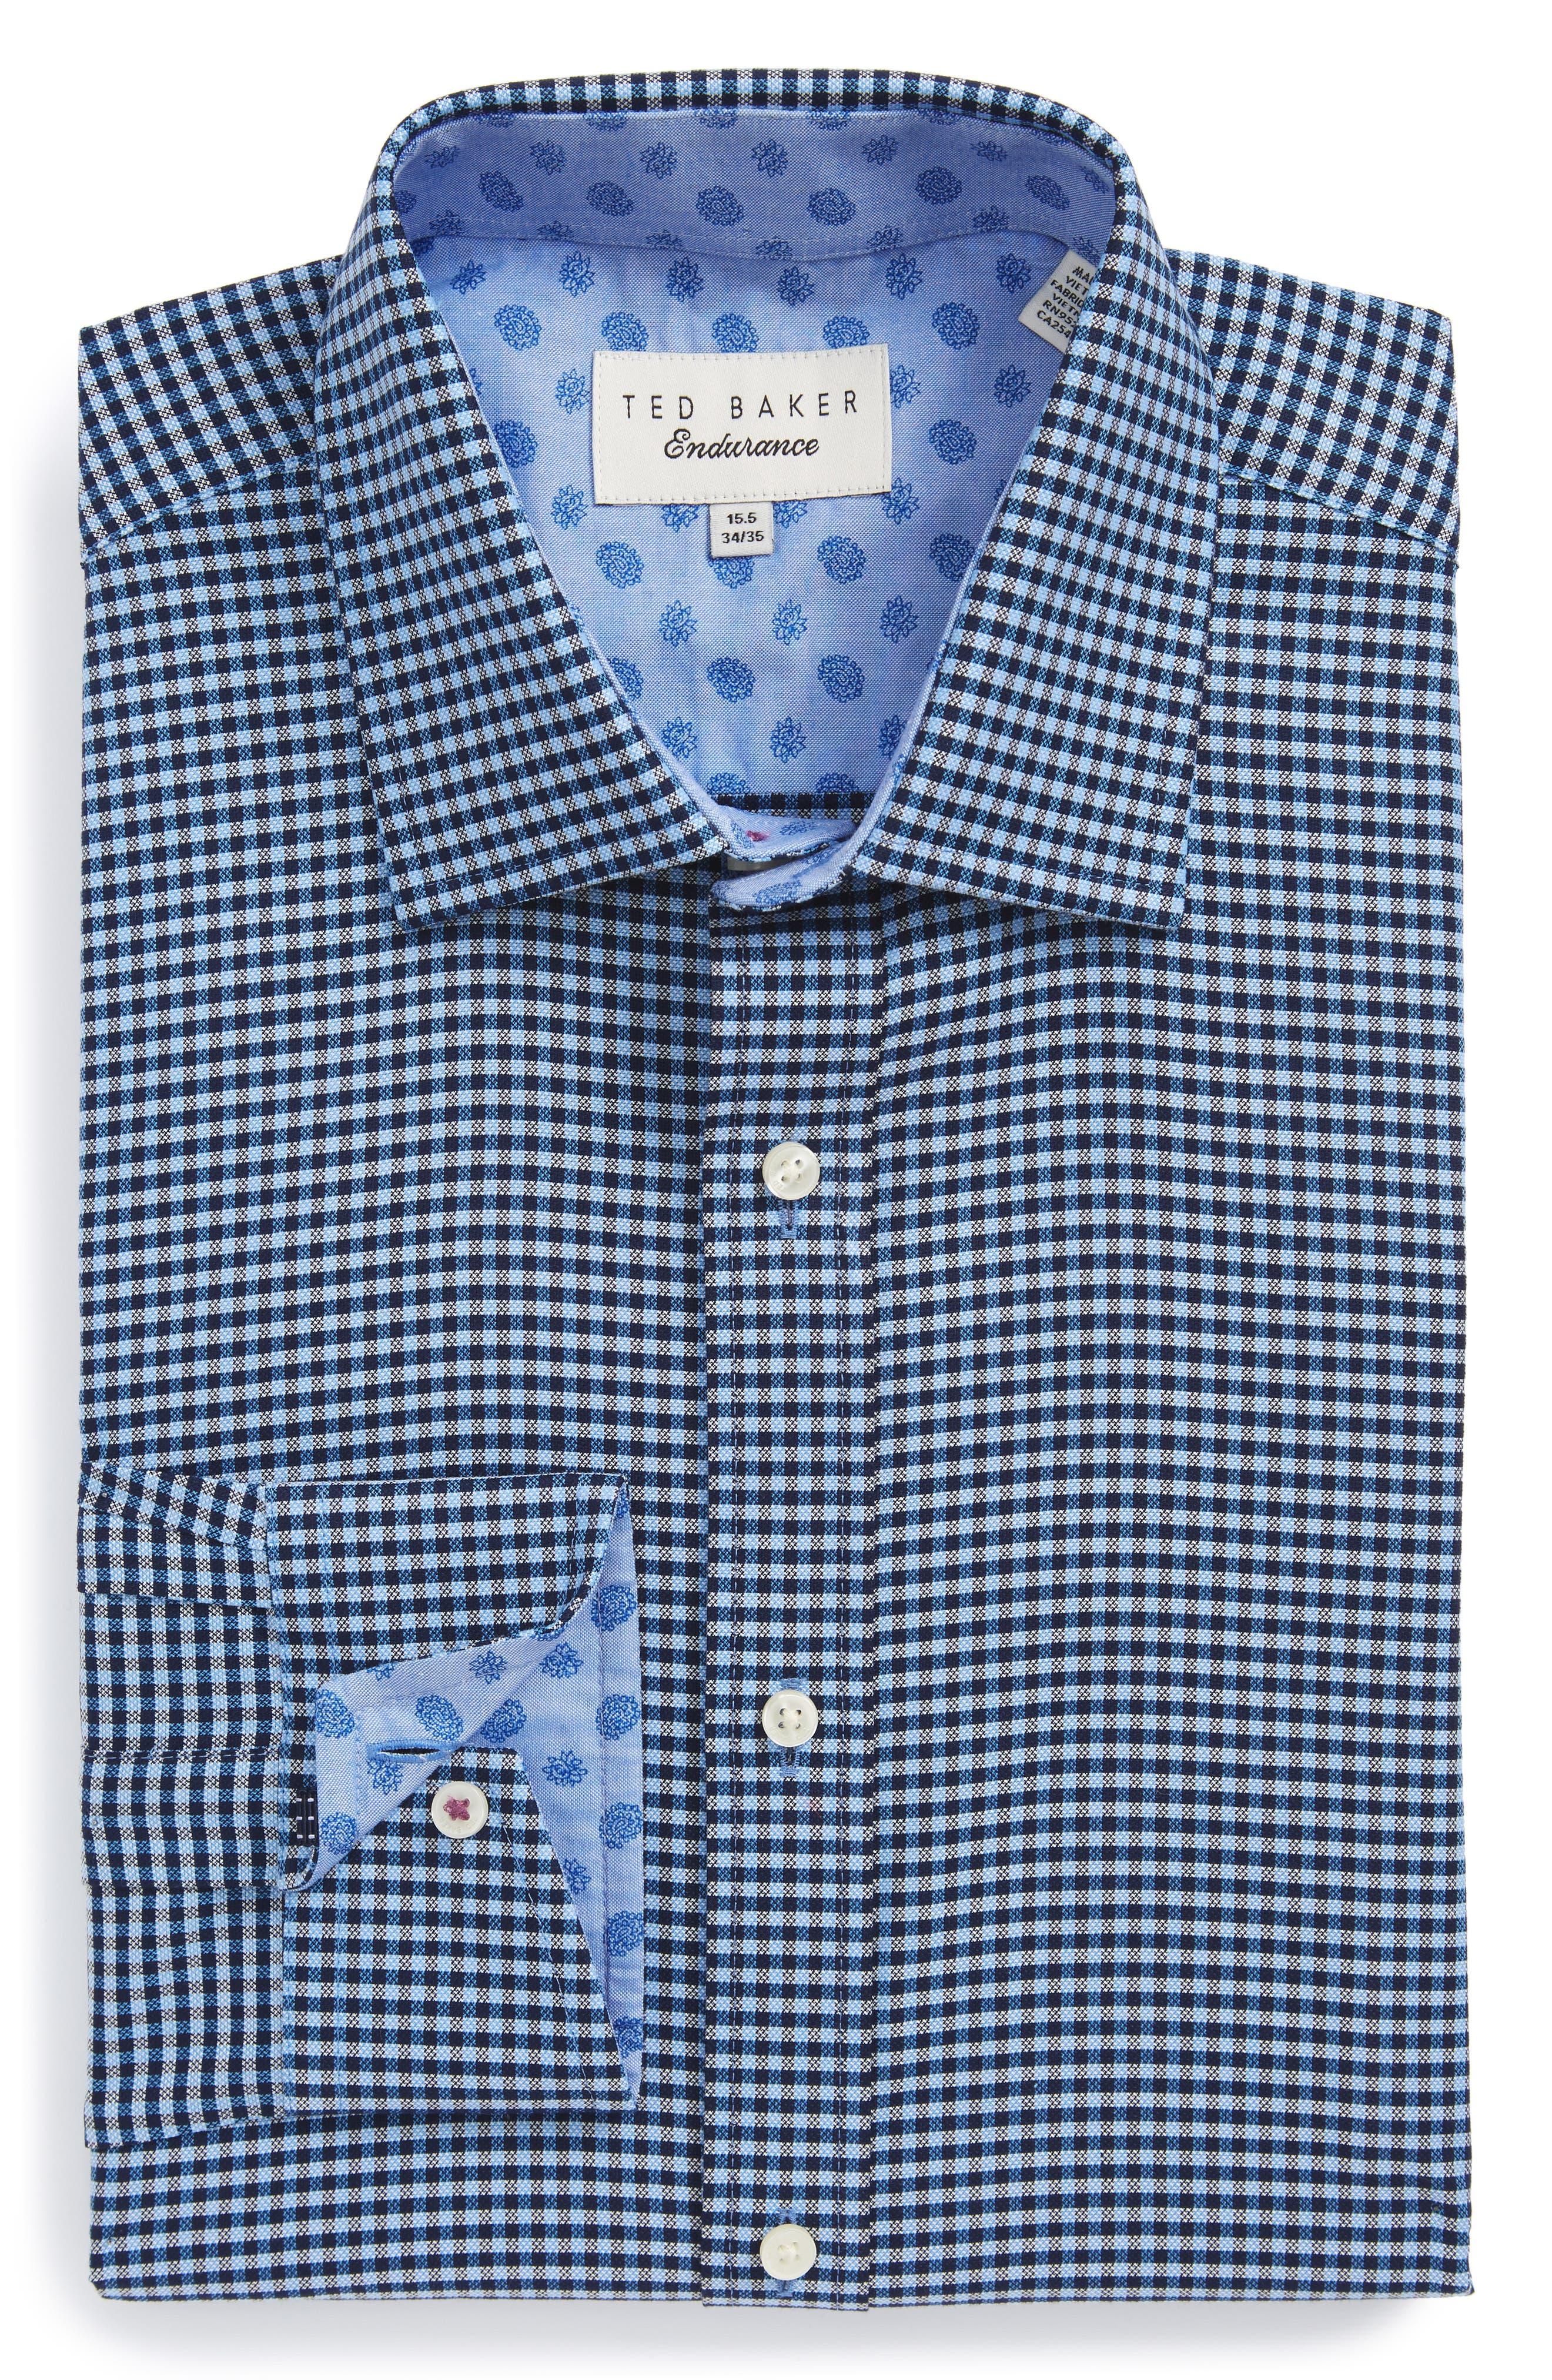 Endurance Sterling Trim Fit Dress Shirt,                         Main,                         color, Blue